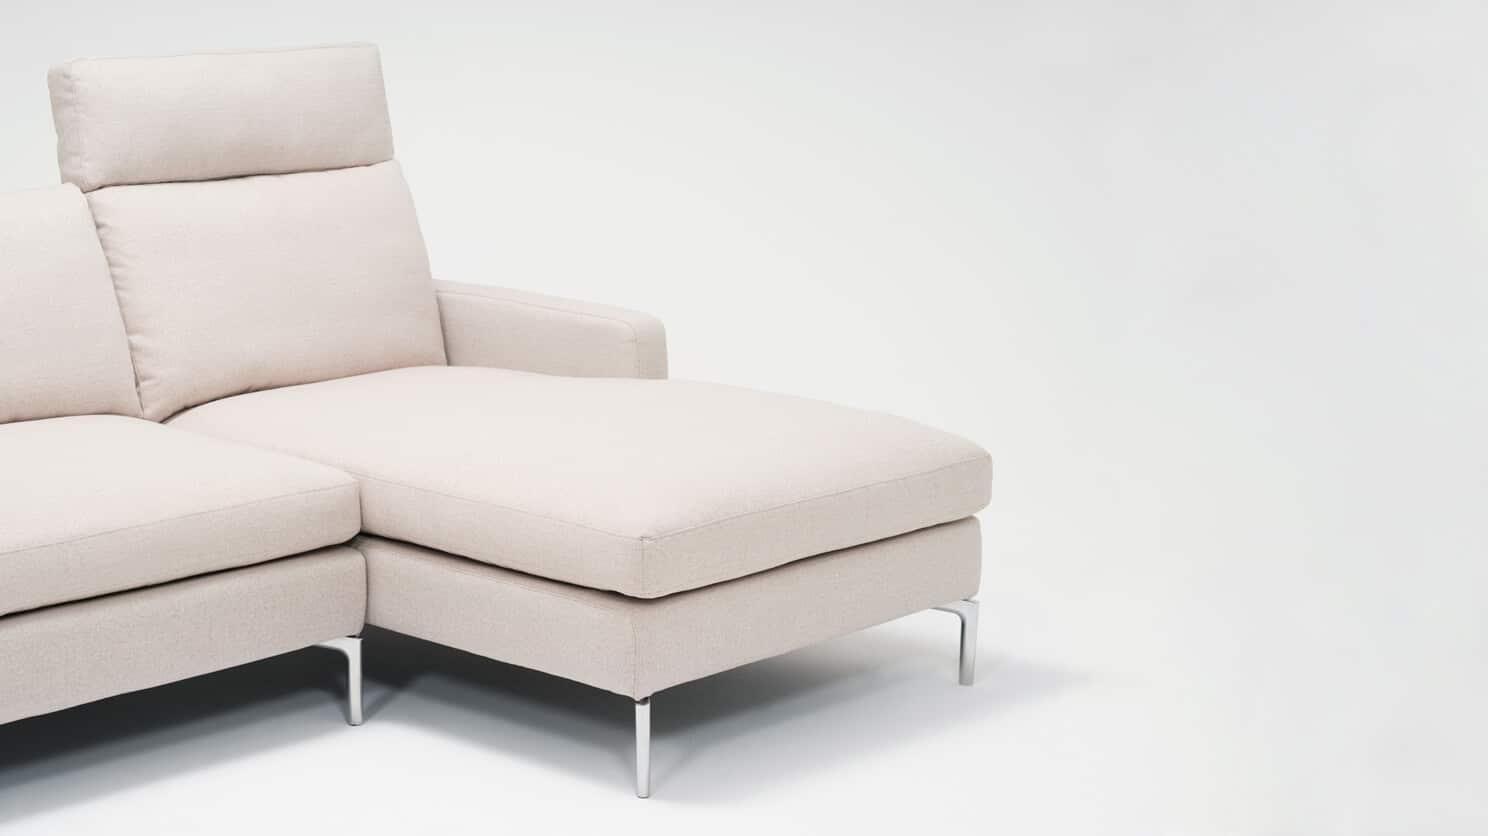 31127 sl sc h 3 sectionals eve 2 piece headrest panama natural